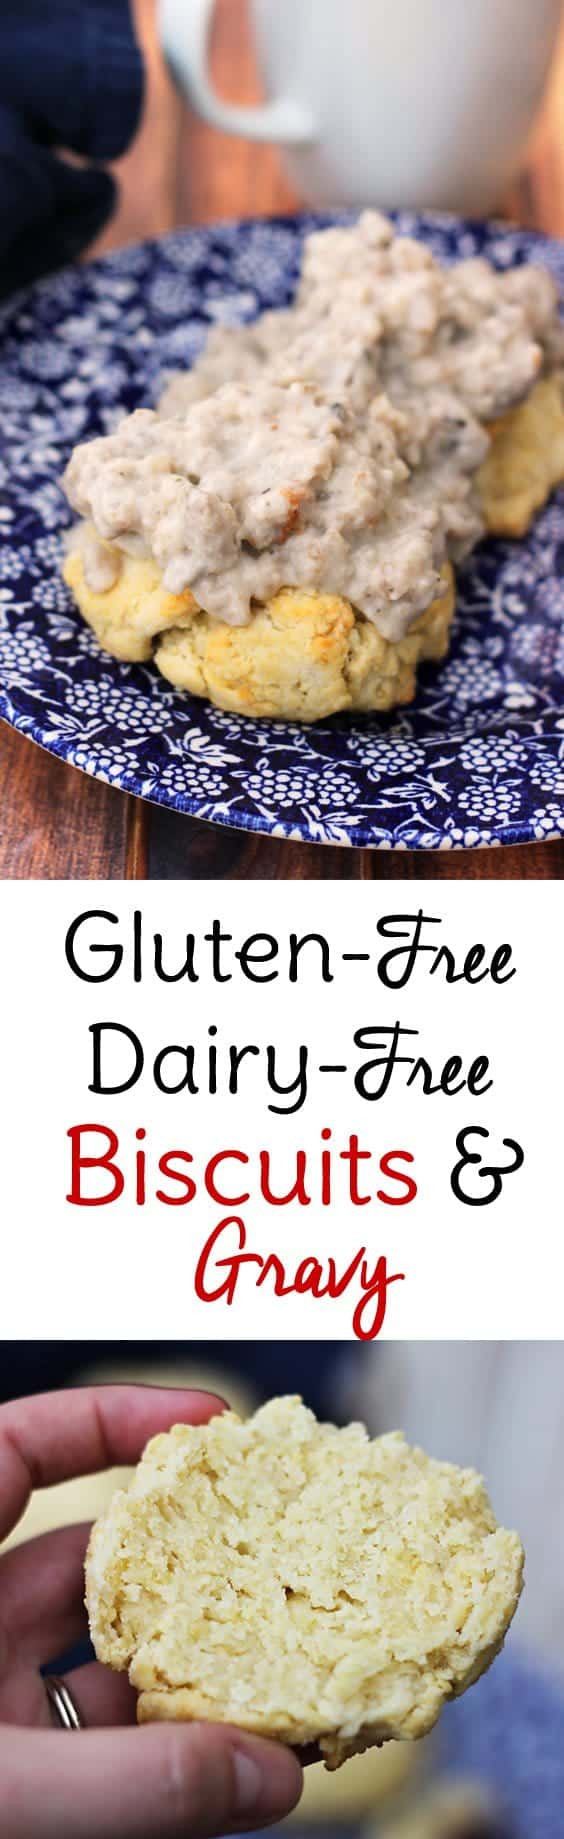 Dairy Free Biscuits And Gravy  Gluten Free Biscuits and Gravy Recipe